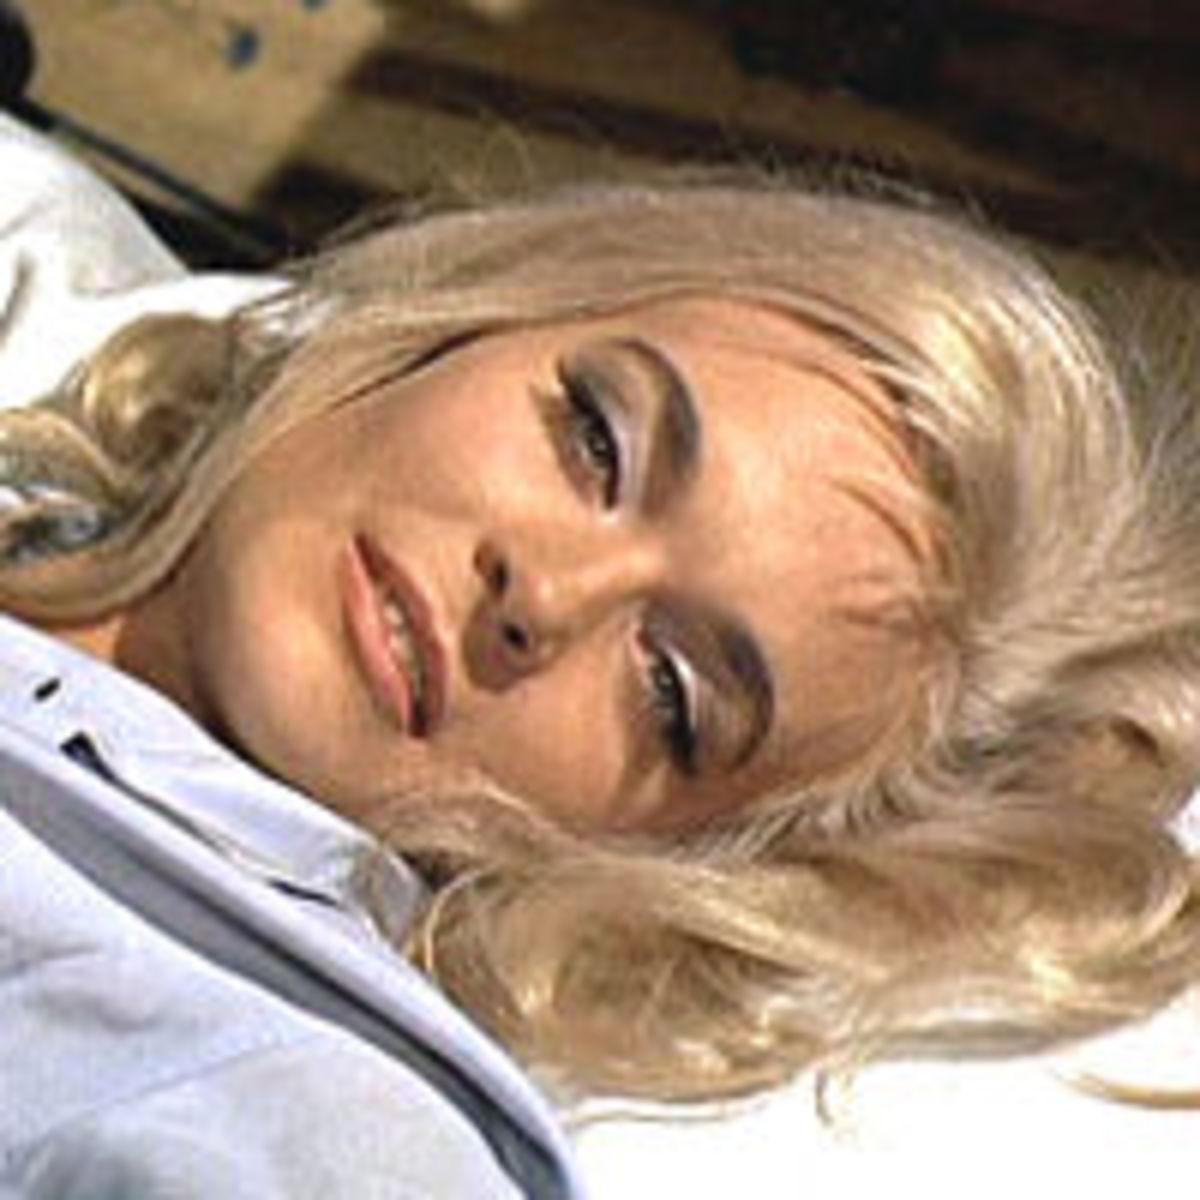 Shirley Eaton as Jill Masterton